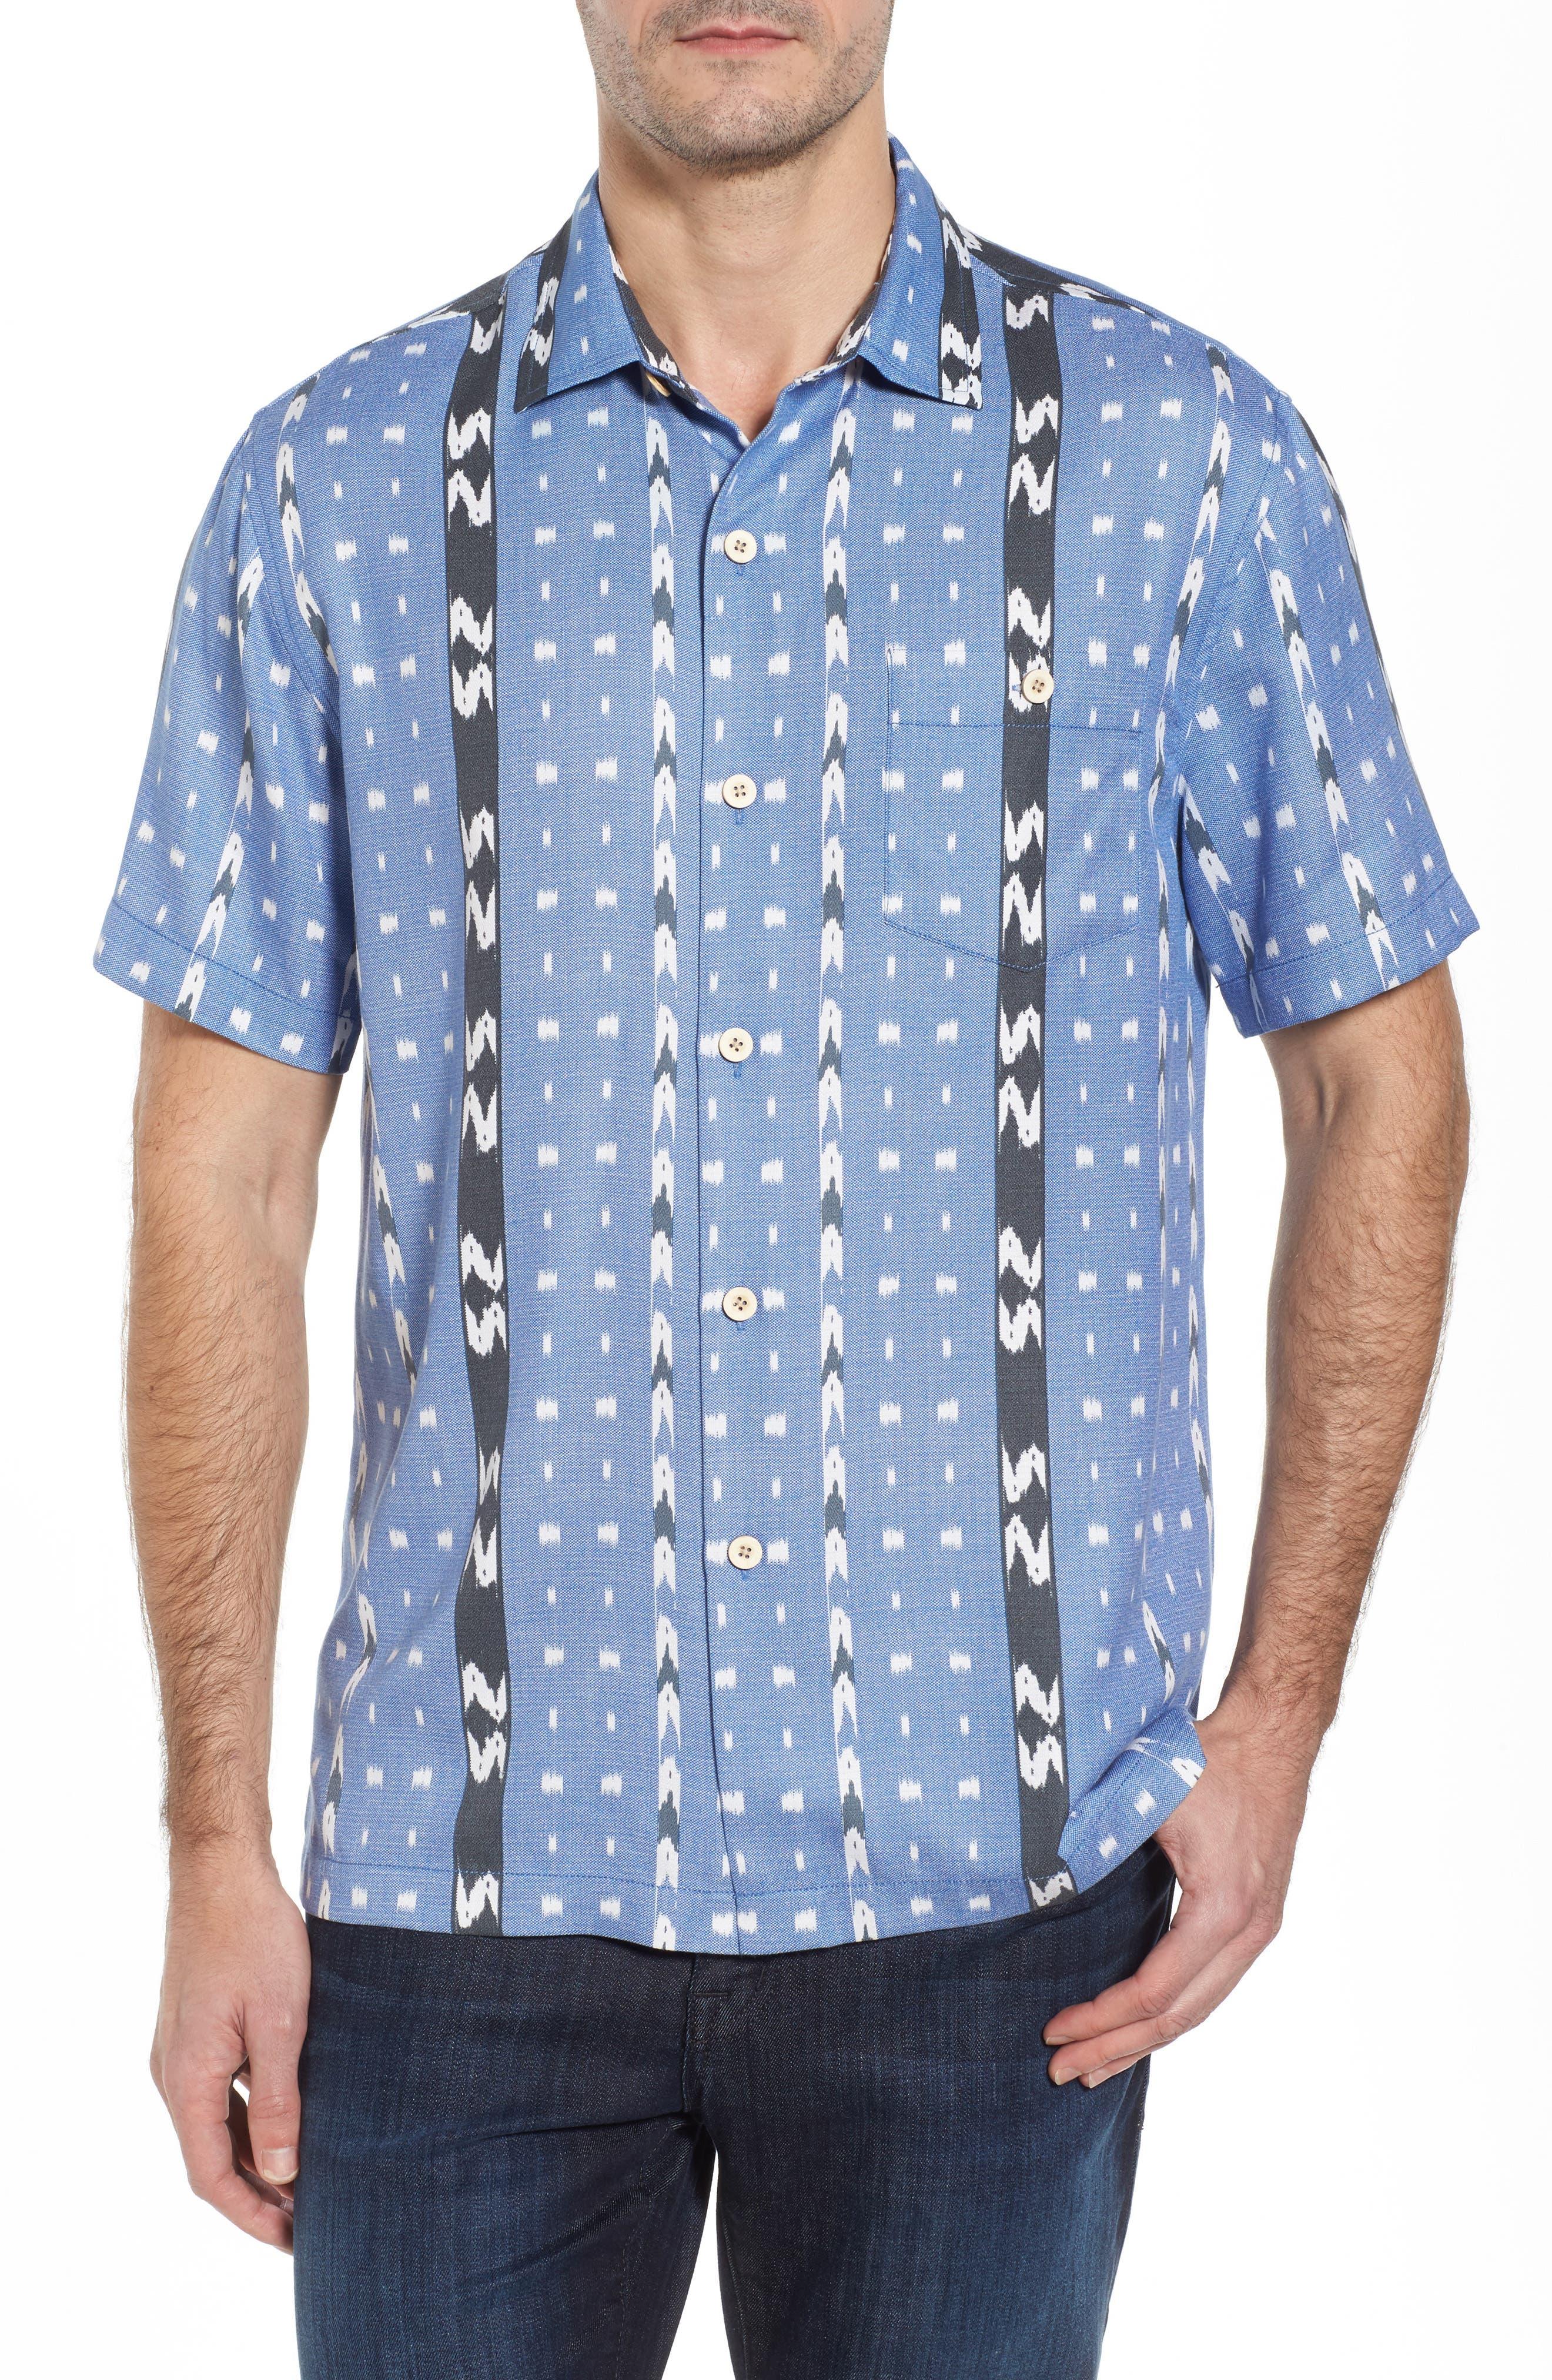 Alternate Image 1 Selected - Tommy Bahama Ikat Don't Stop Silk Blend Camp Shirt